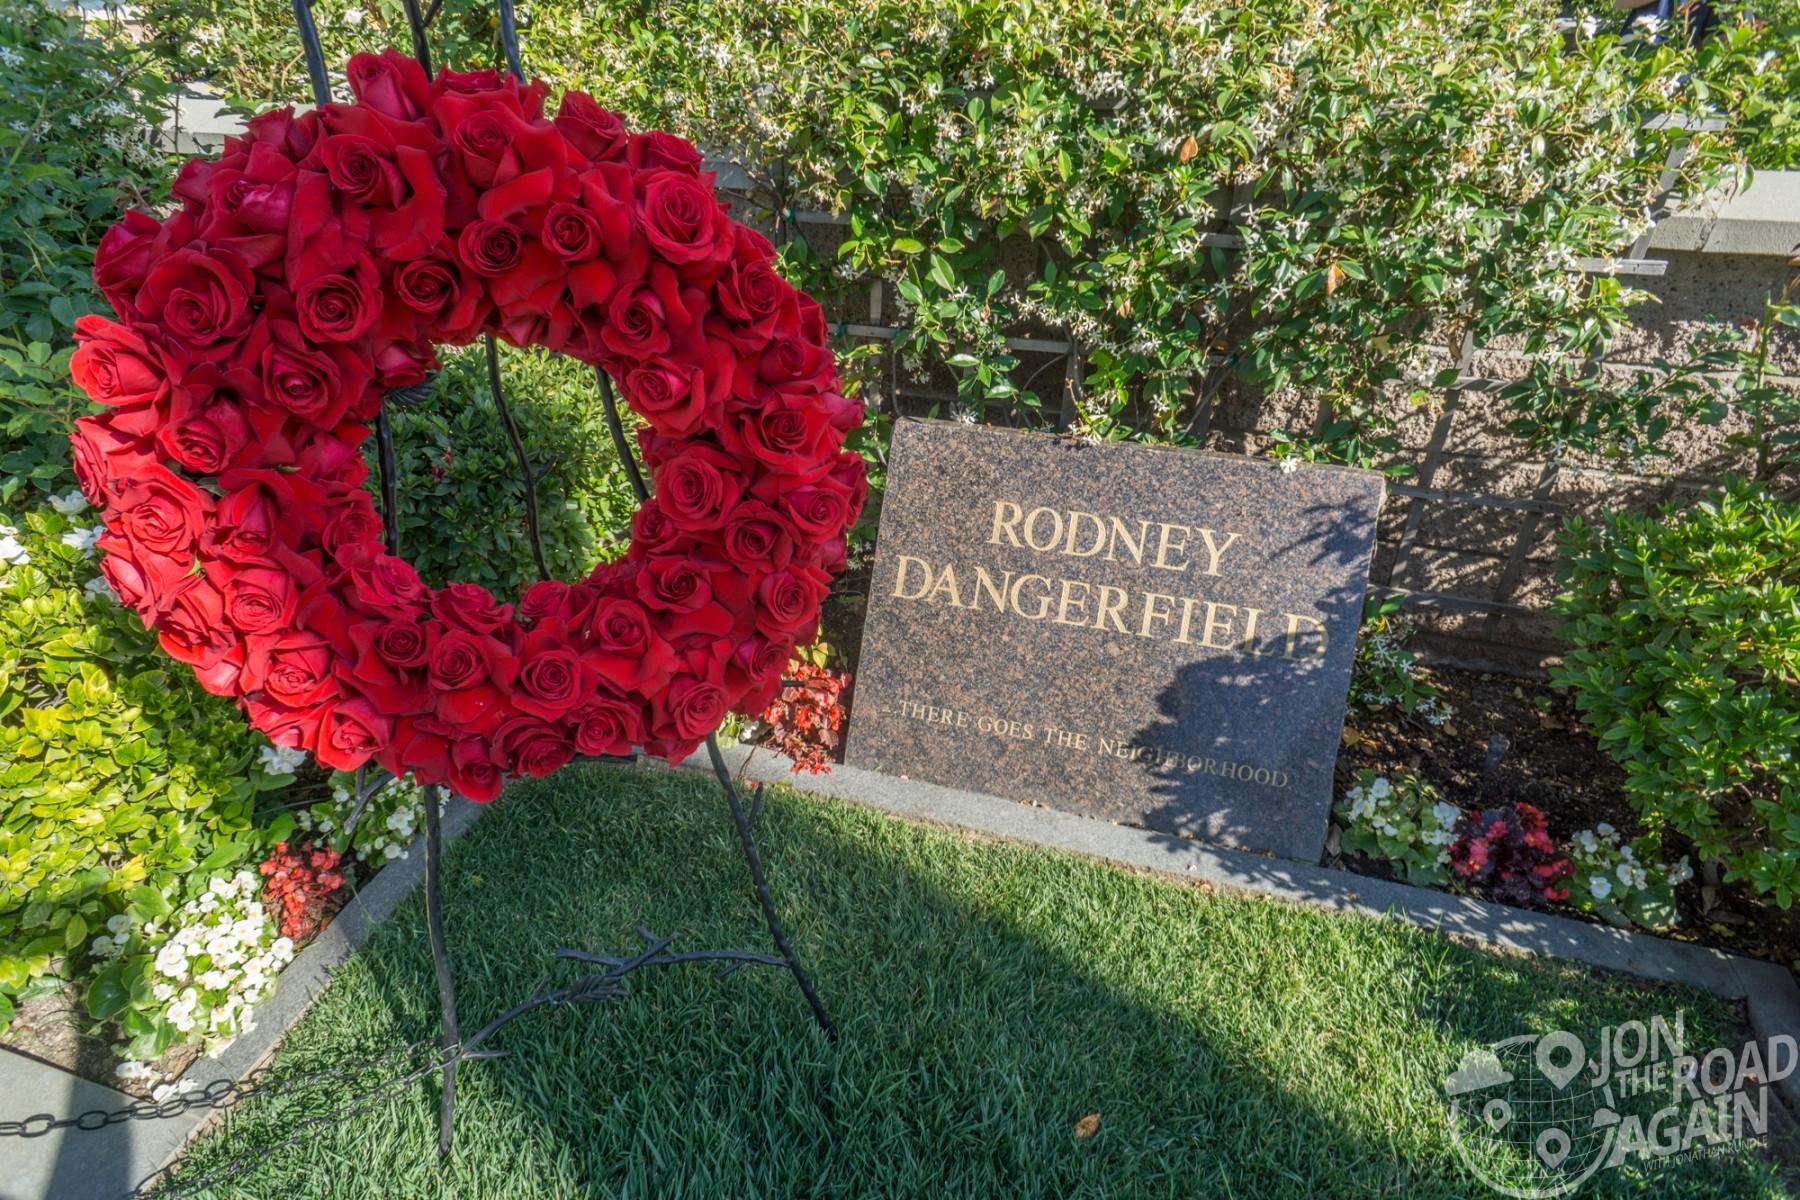 Rodney Dangerfield grave